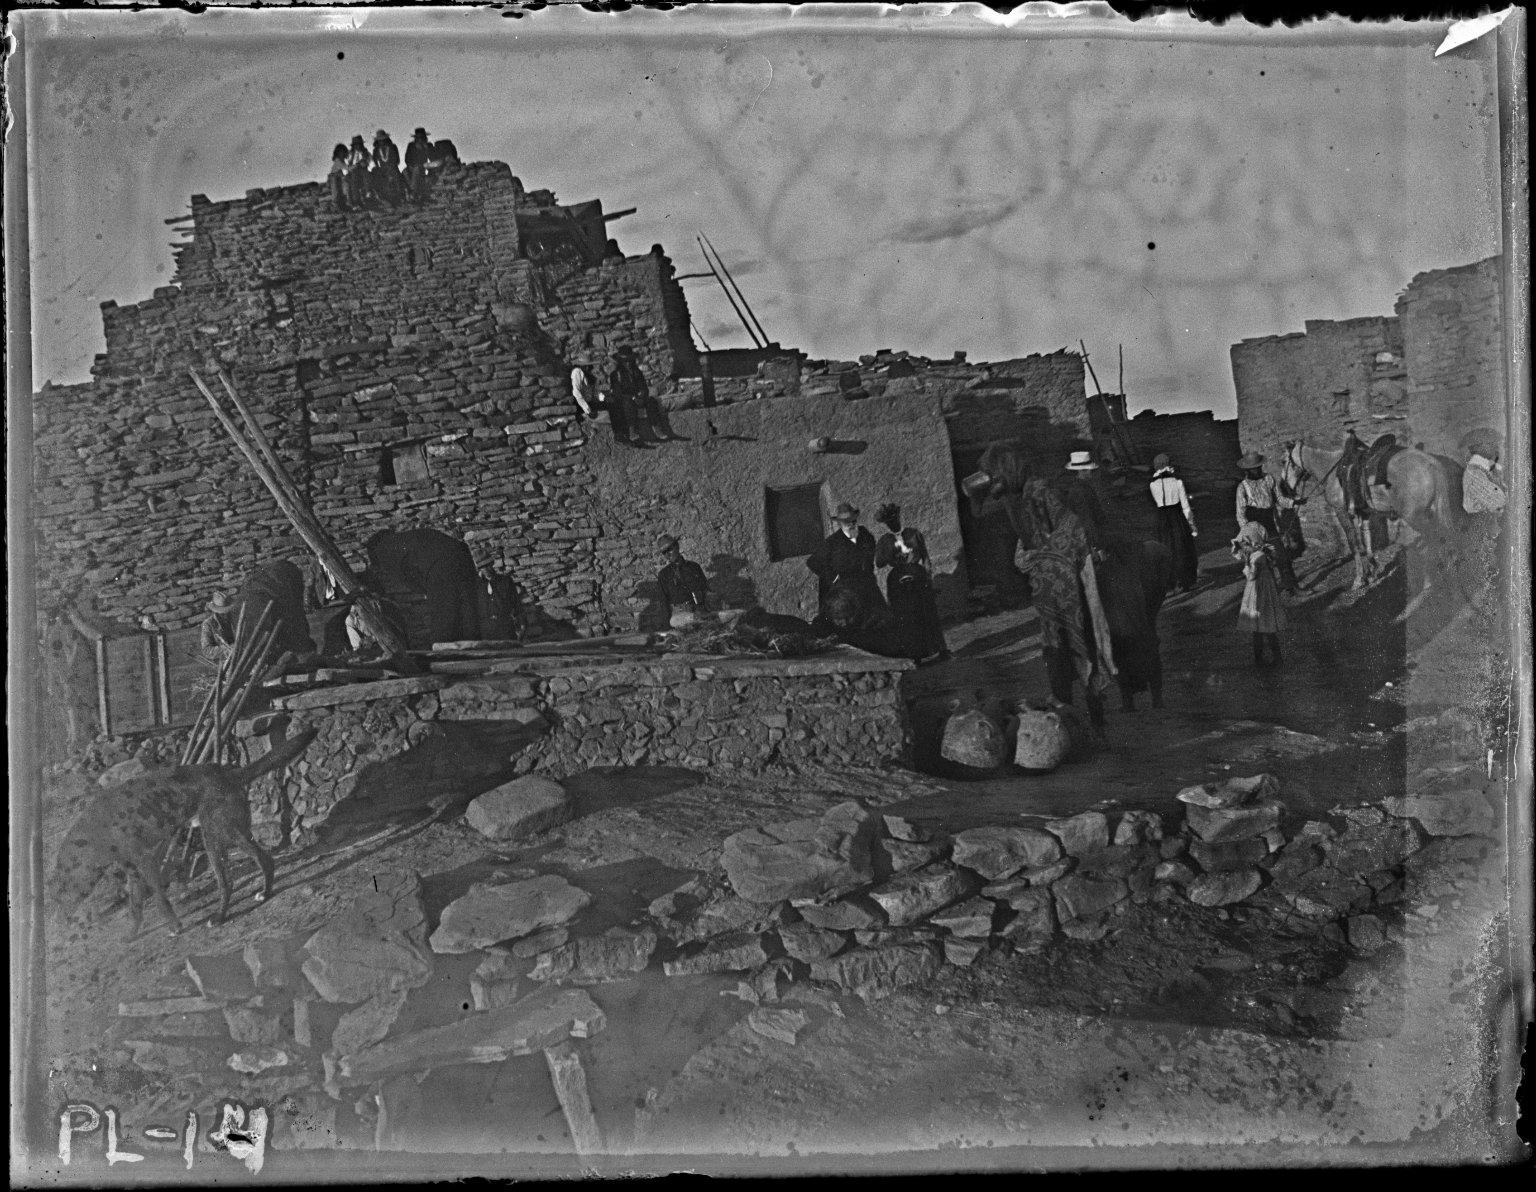 Backwall of Pueblo house